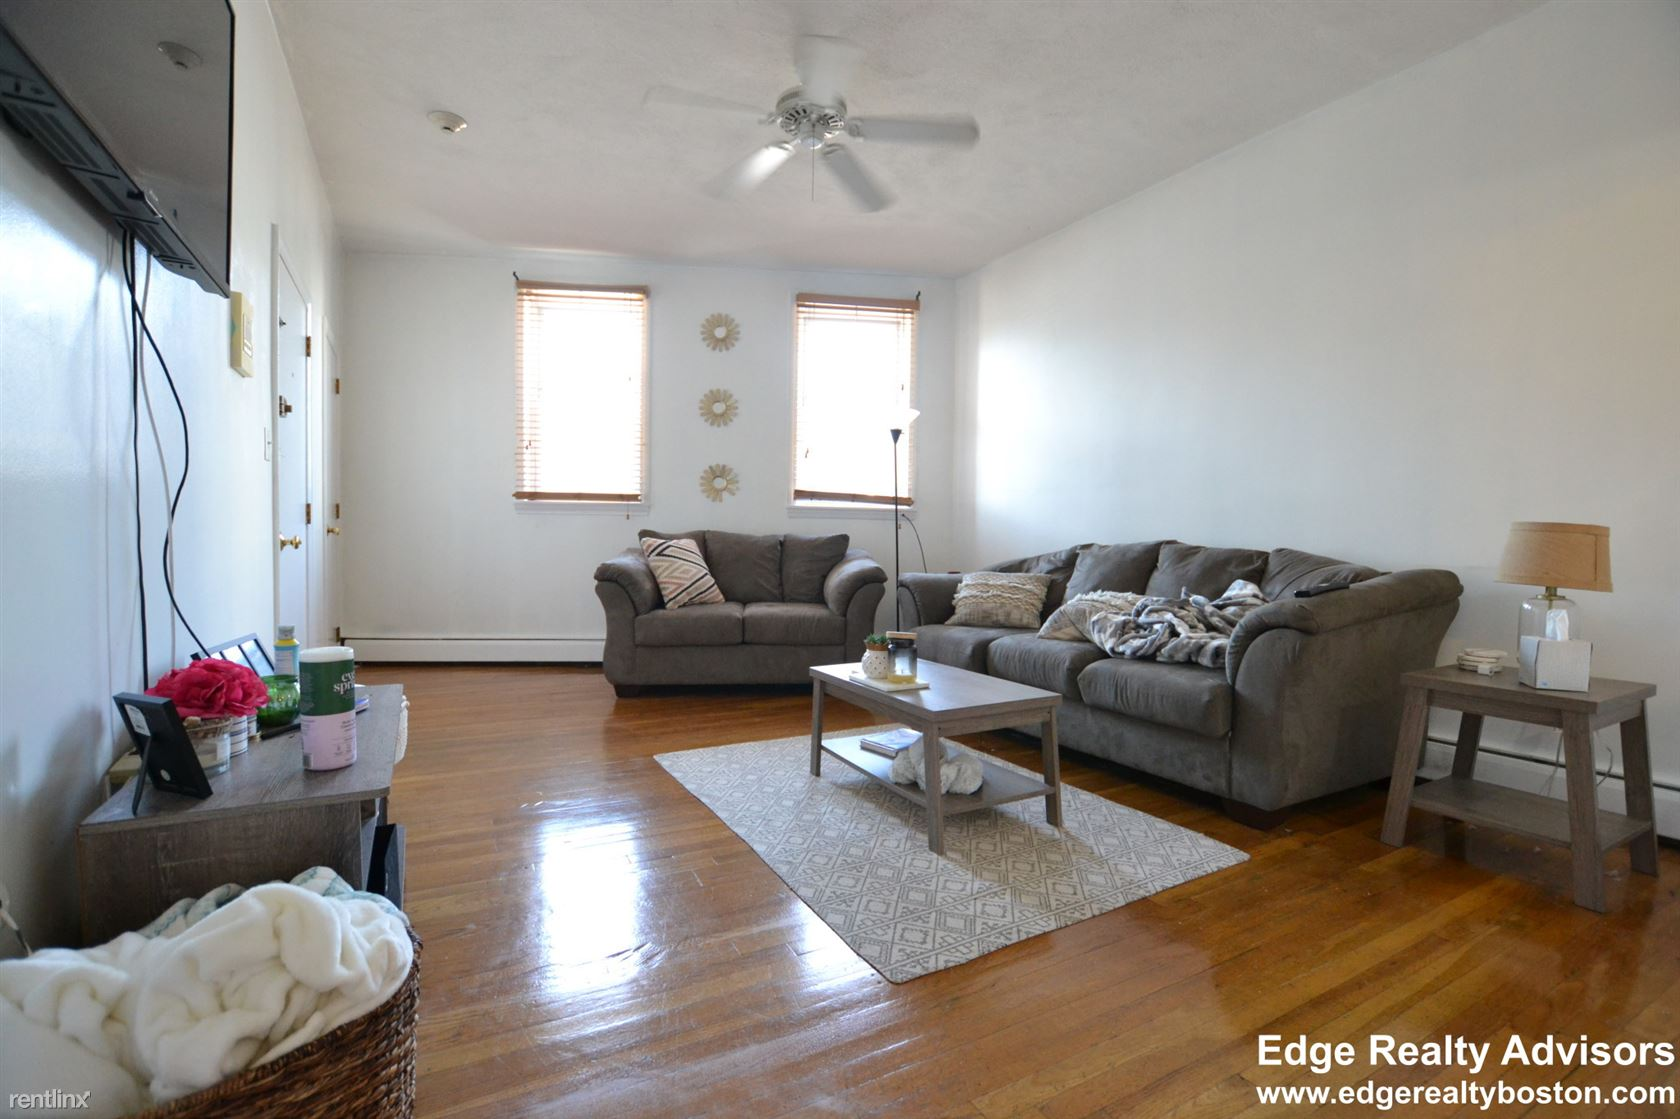 130 Emerson St Apt 10, South Boston, MA - $2,350 USD/ month